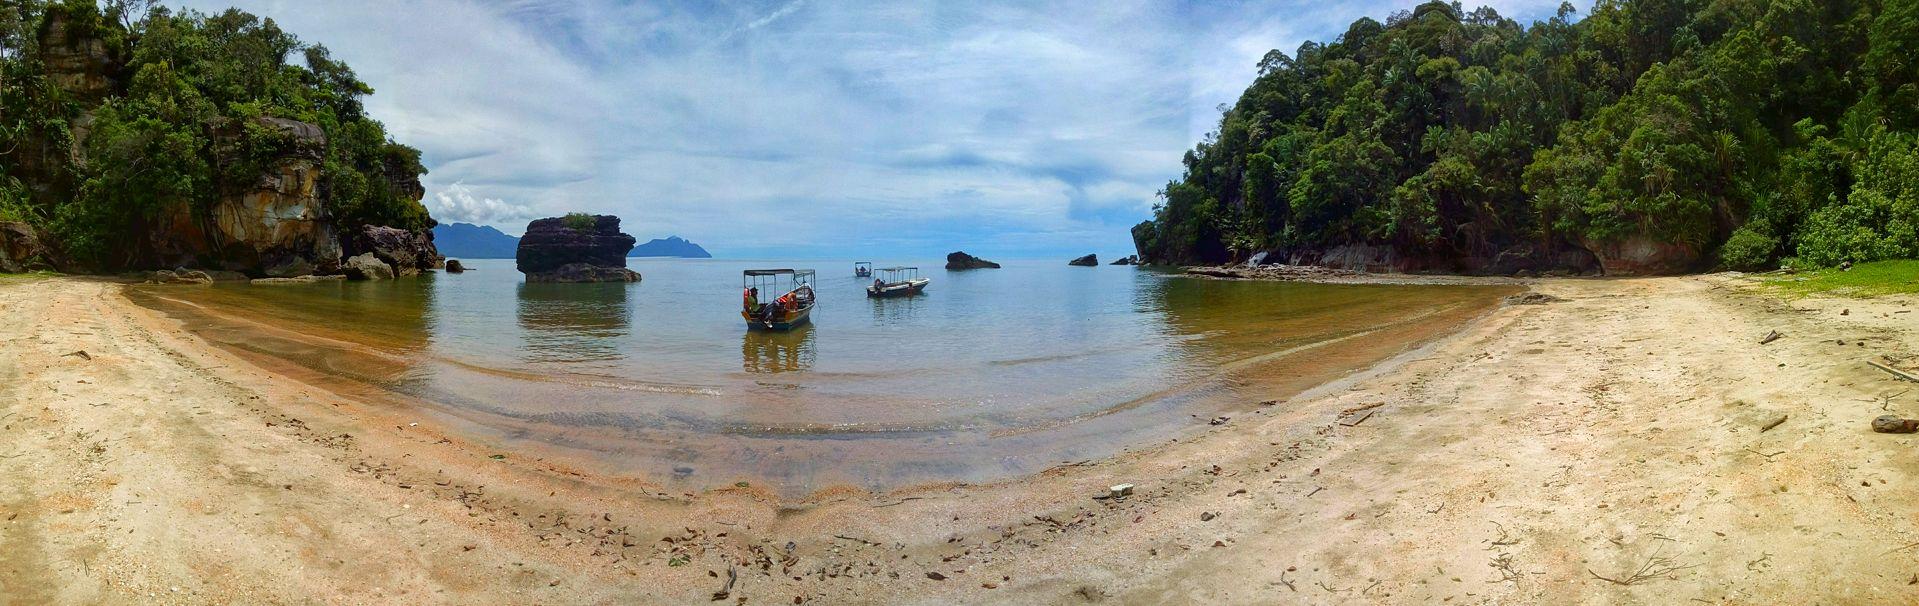 Park Narodowy Bako na Borneo - Panorama